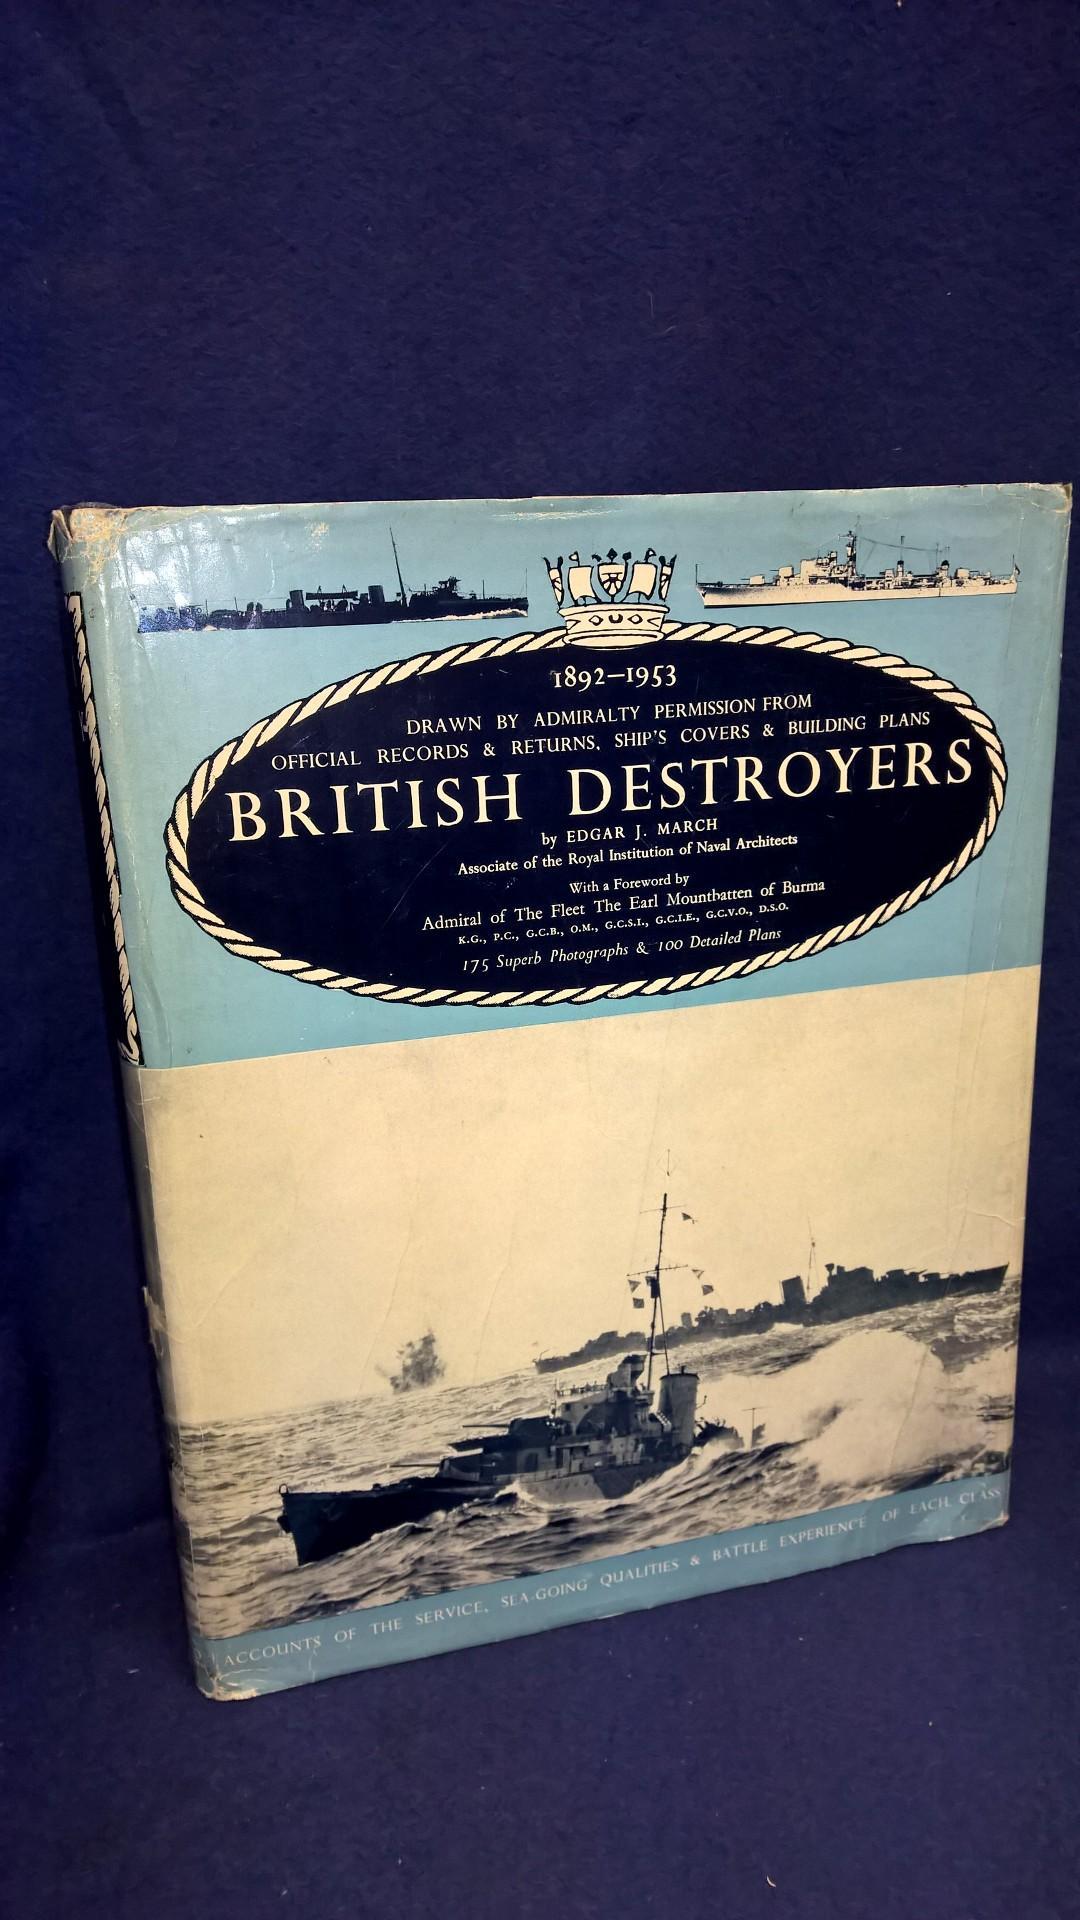 British Destroyers. A history of development 1892-1953.